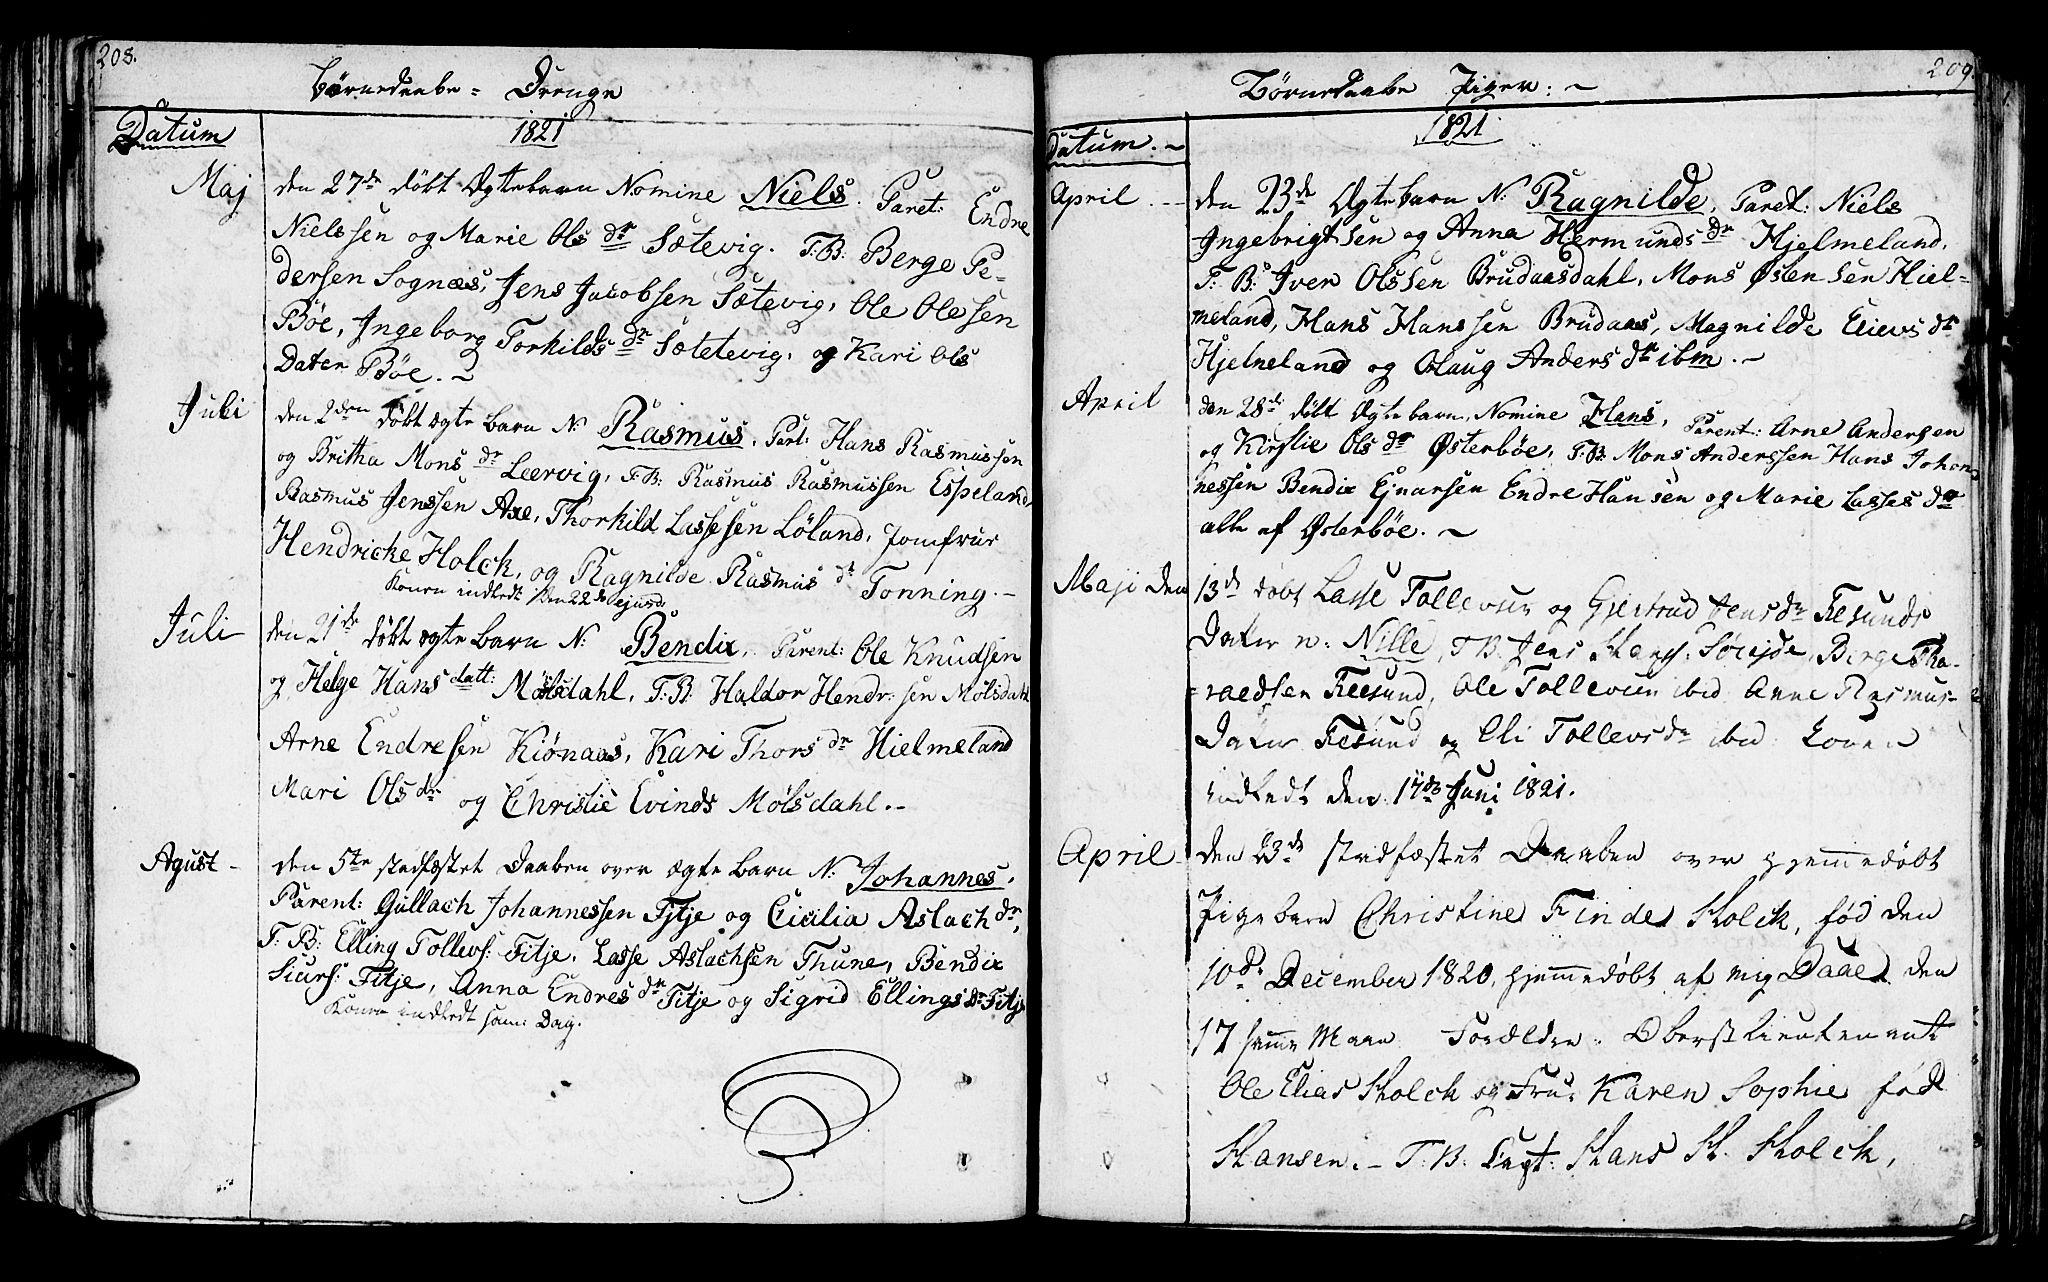 SAB, Lavik sokneprestembete, Parish register (official) no. A 1, 1809-1822, p. 208-209